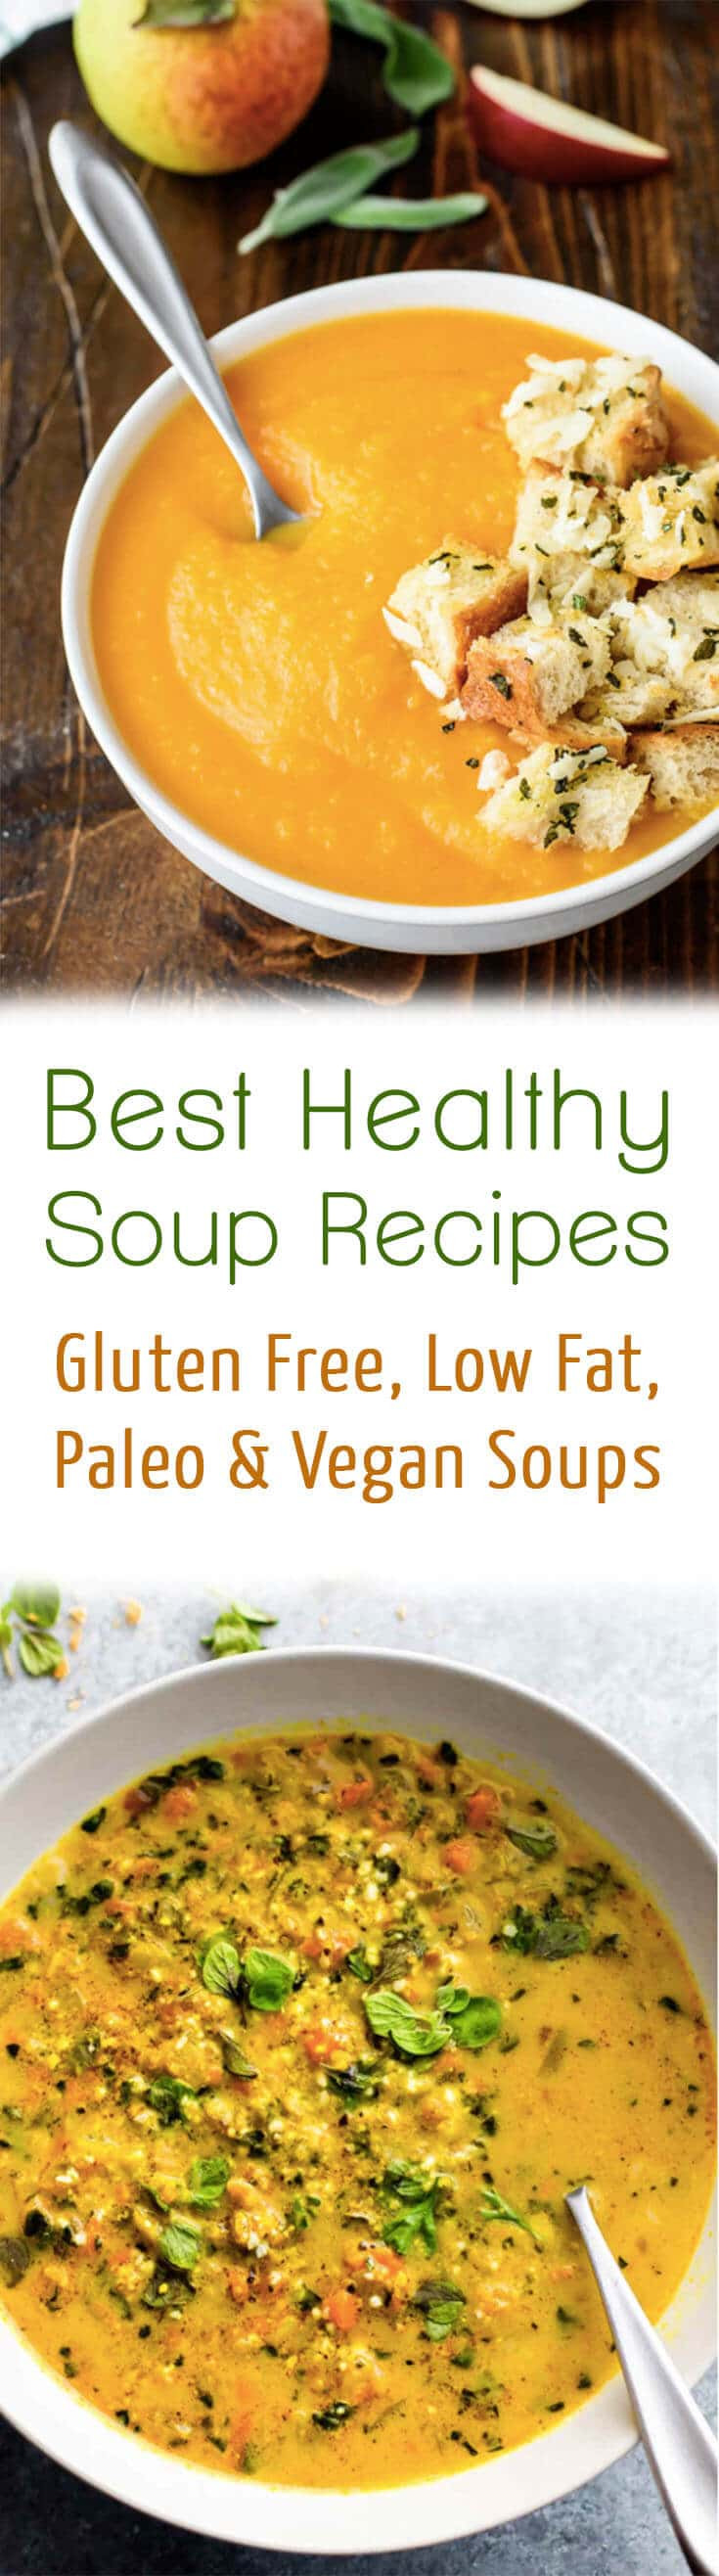 Best Healthy Soups  10 Best Healthy Soup Recipes